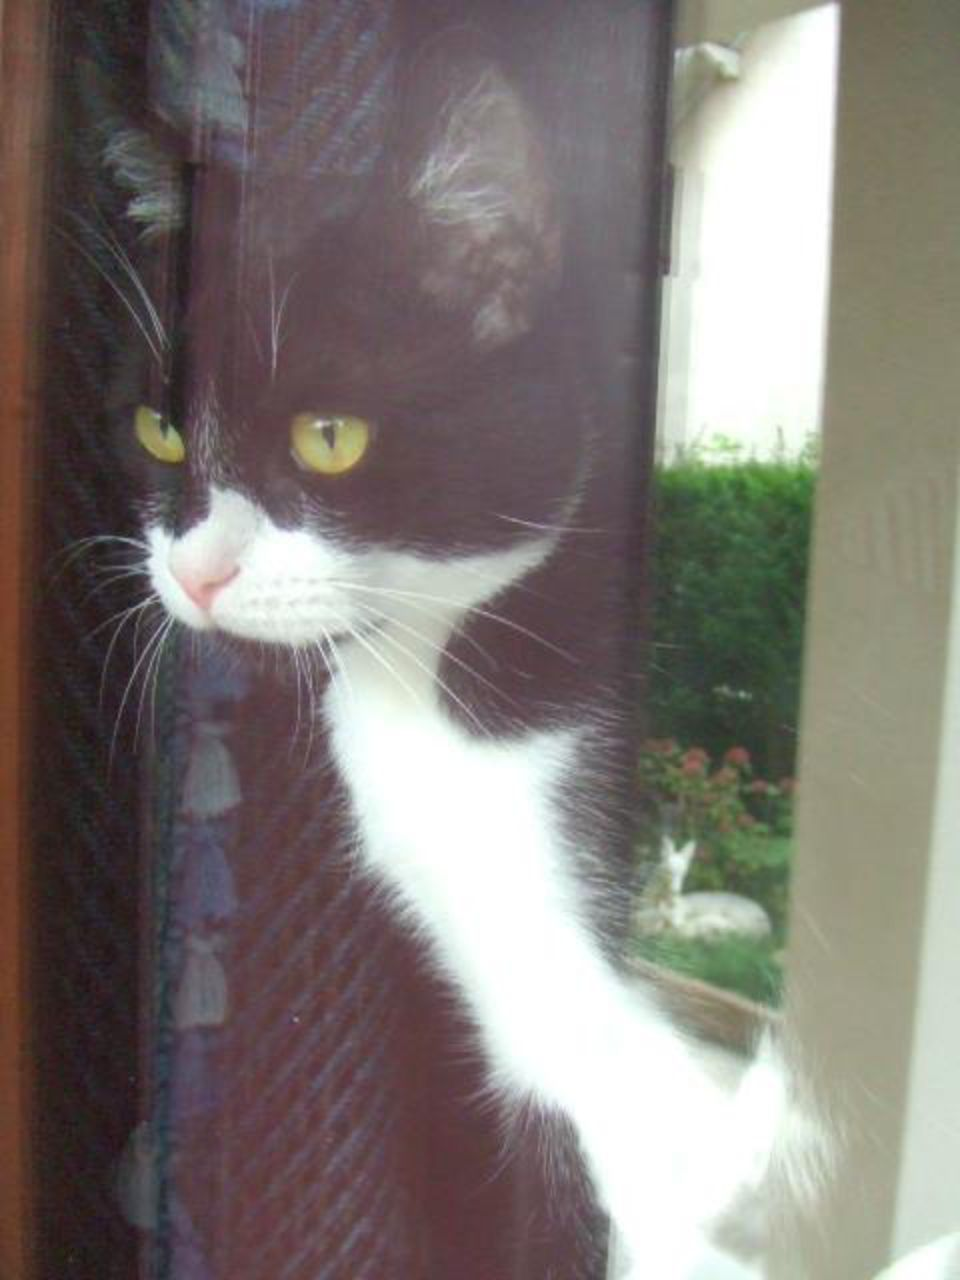 Christine Arinki à la fenêtre